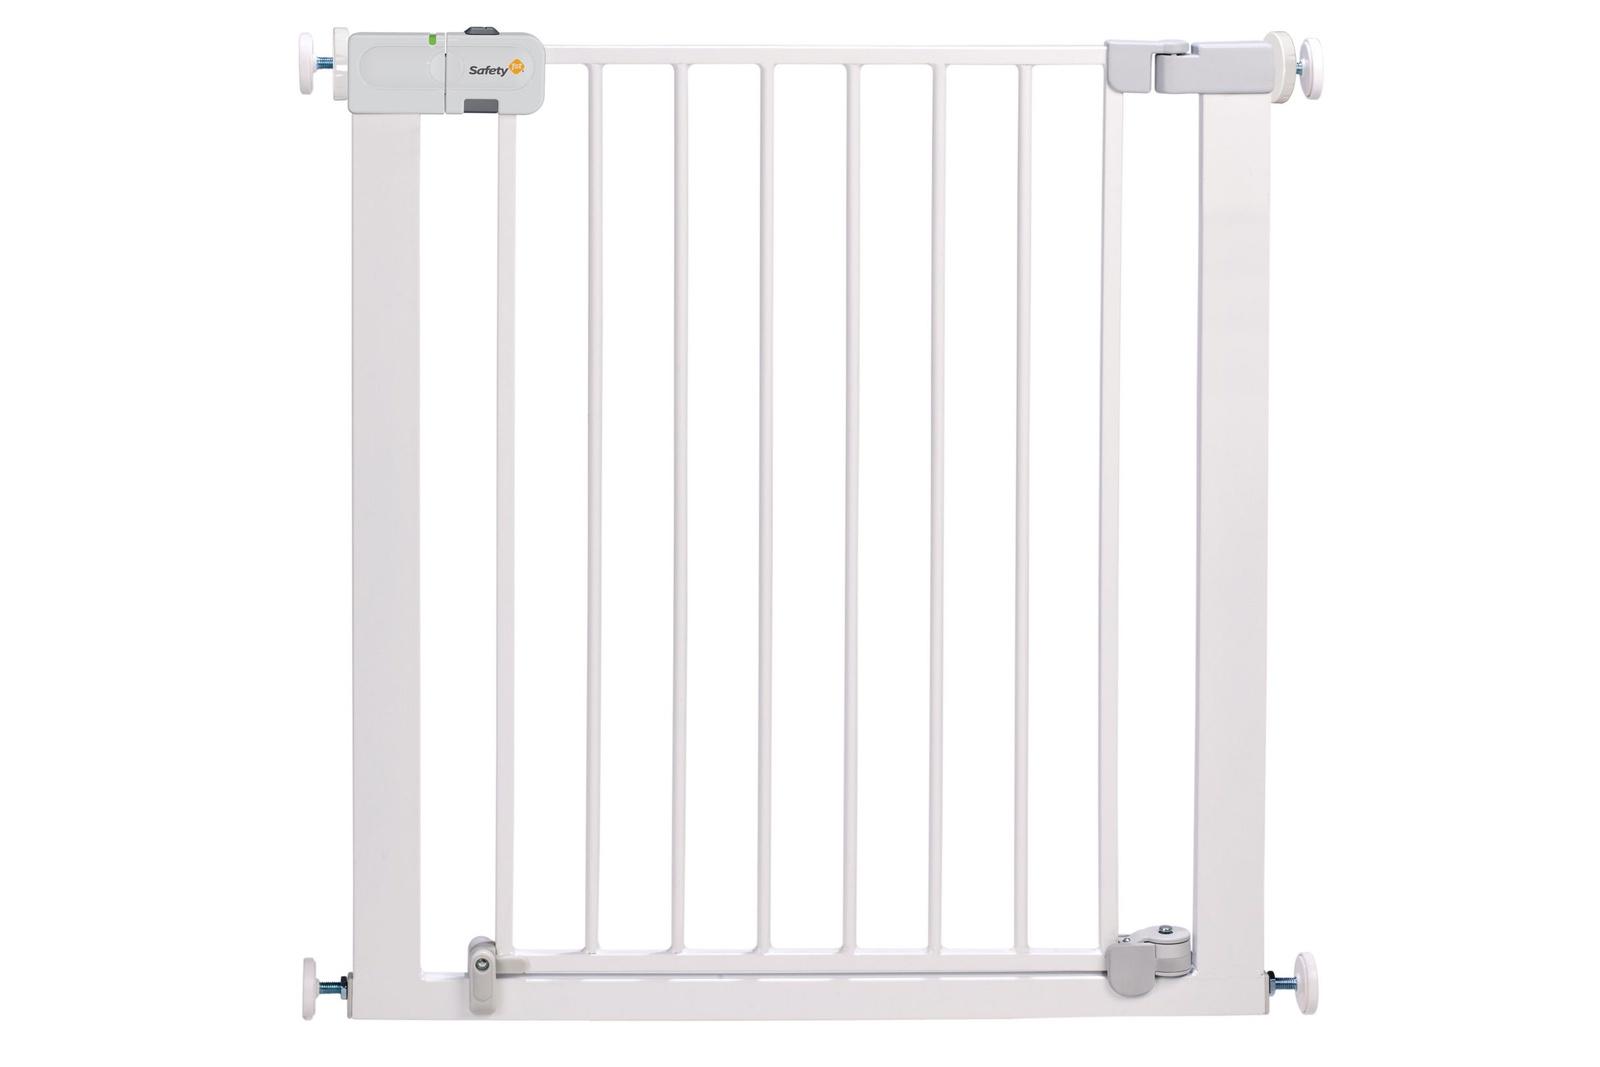 цена Ворота безопасности Safety 1st Металлический барьер-калитка Safety 1st AUTO CLOSE 73-80 см 24484310, 24484310 онлайн в 2017 году